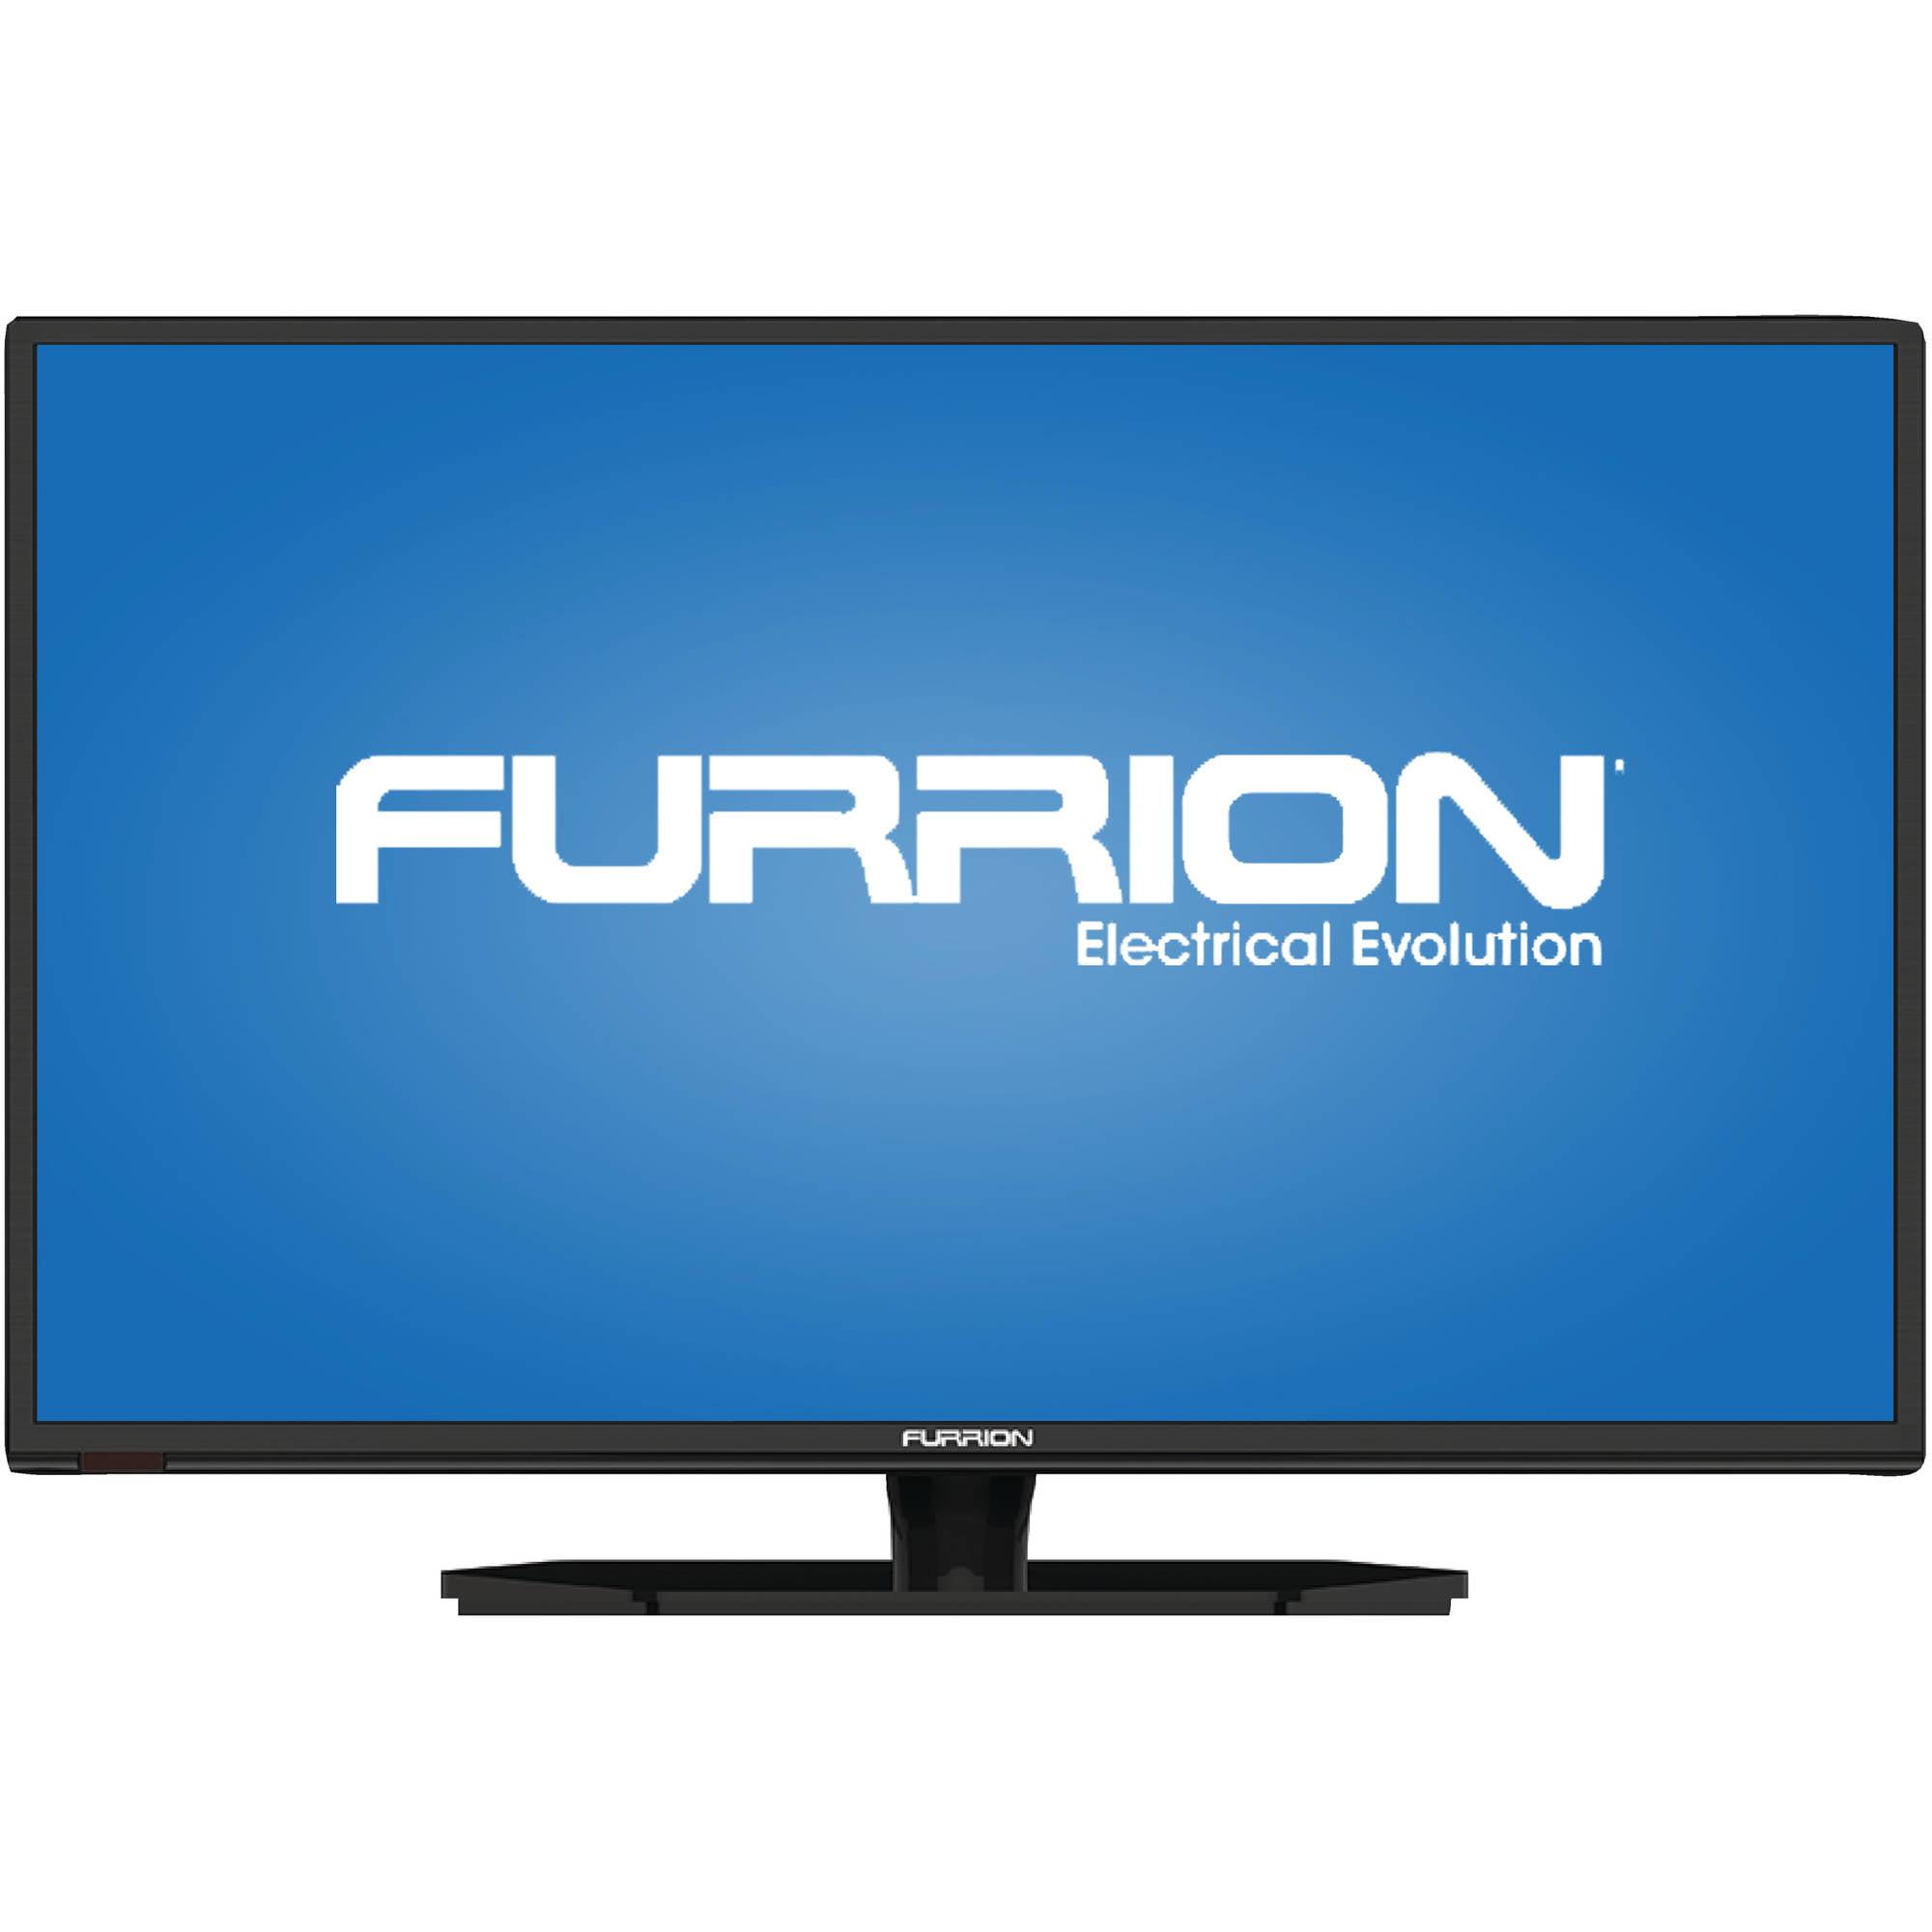 LCD TVs - Top LCD LED TV